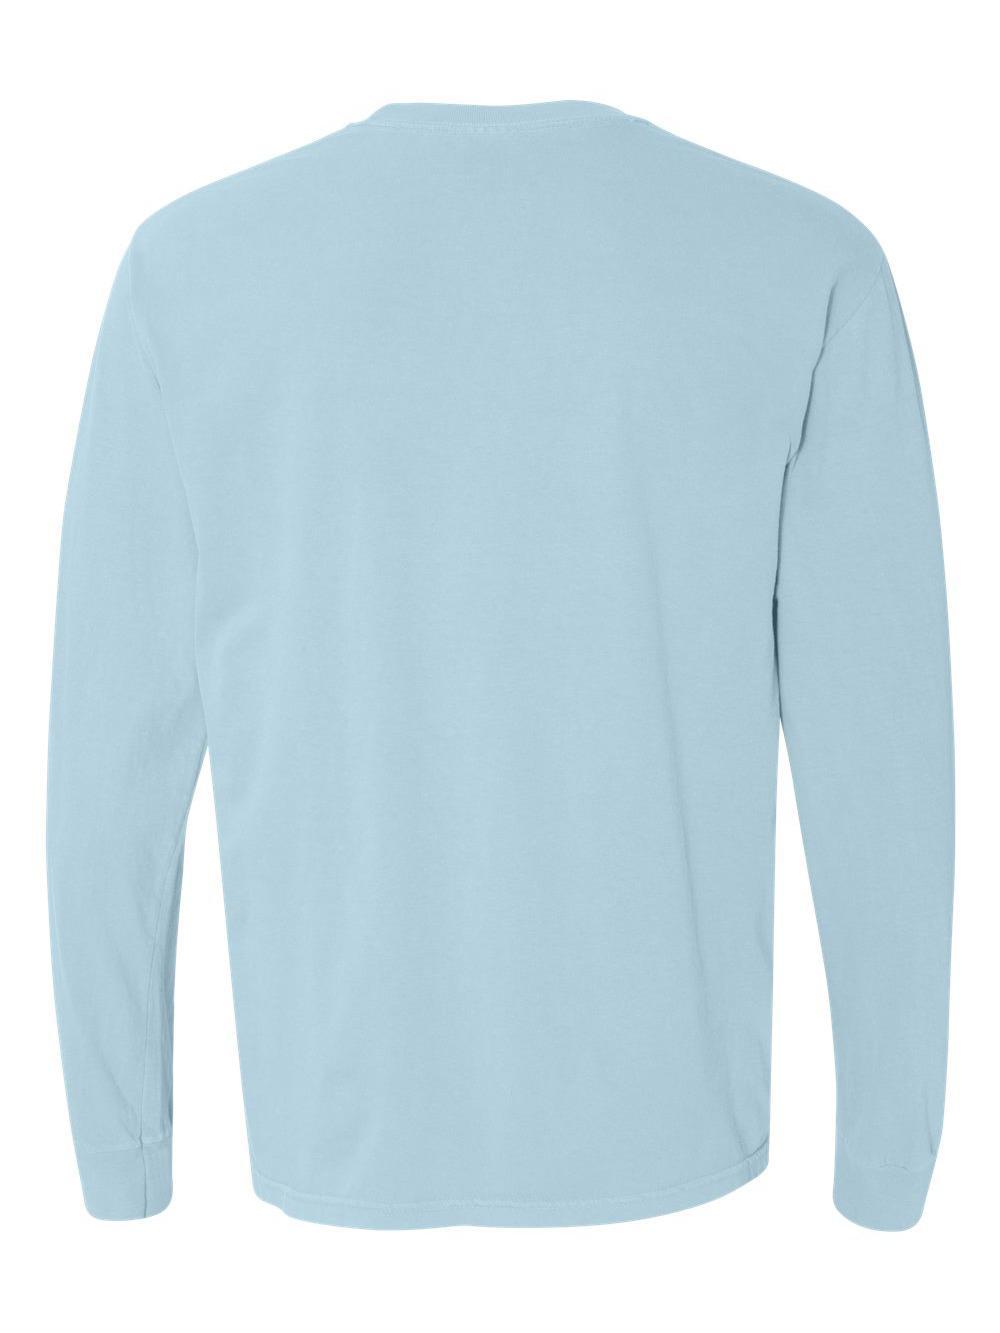 Comfort-Colors-Garment-Dyed-Heavyweight-Ringspun-Long-Sleeve-T-Shirt-6014 thumbnail 28